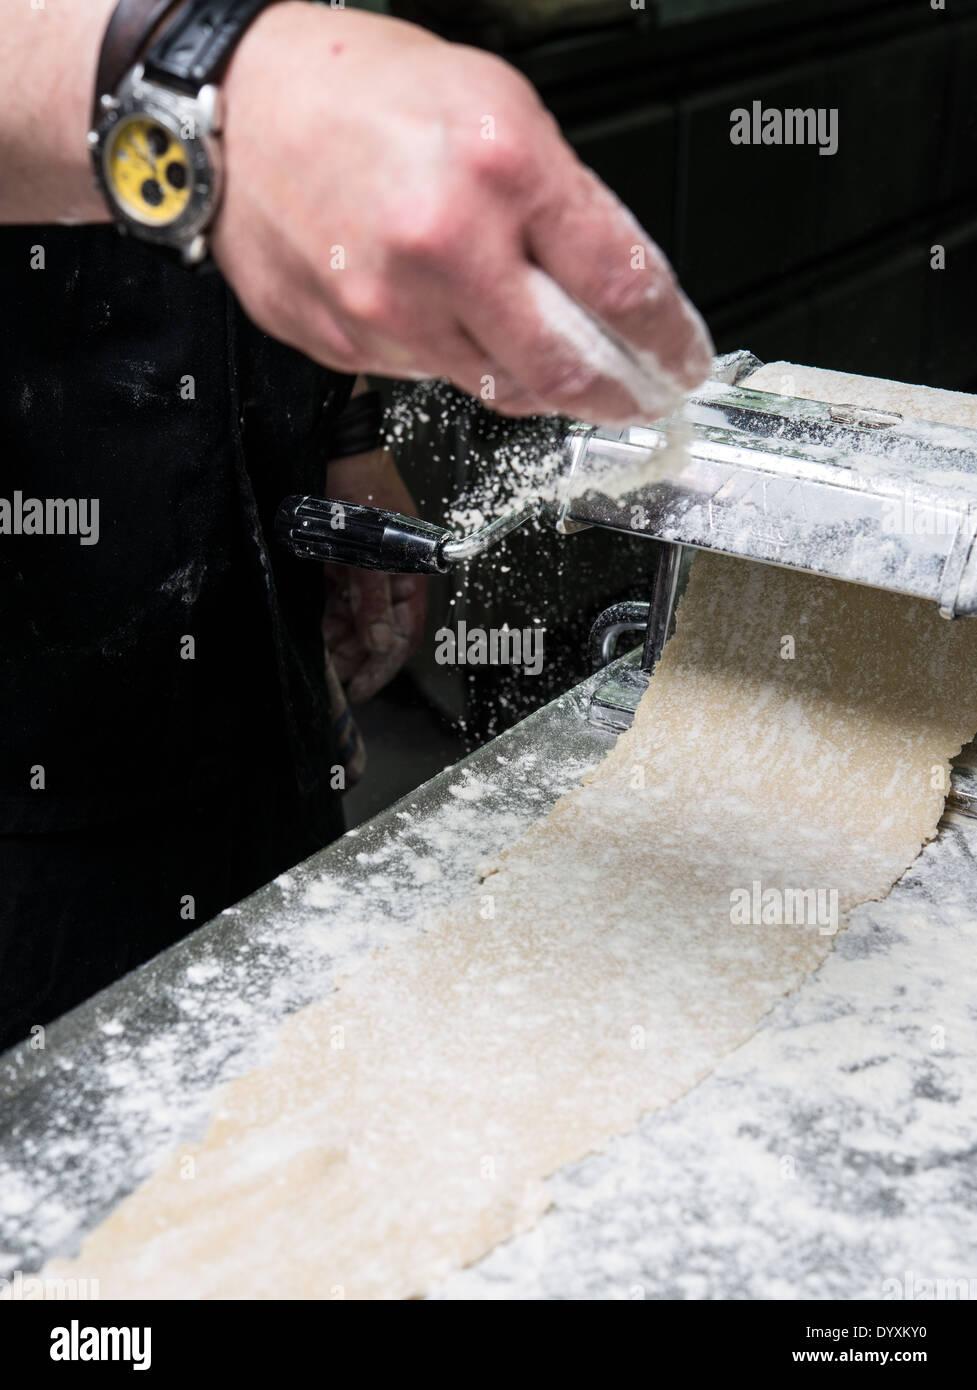 Making Tortellini pasta flattening the dough - Stock Image